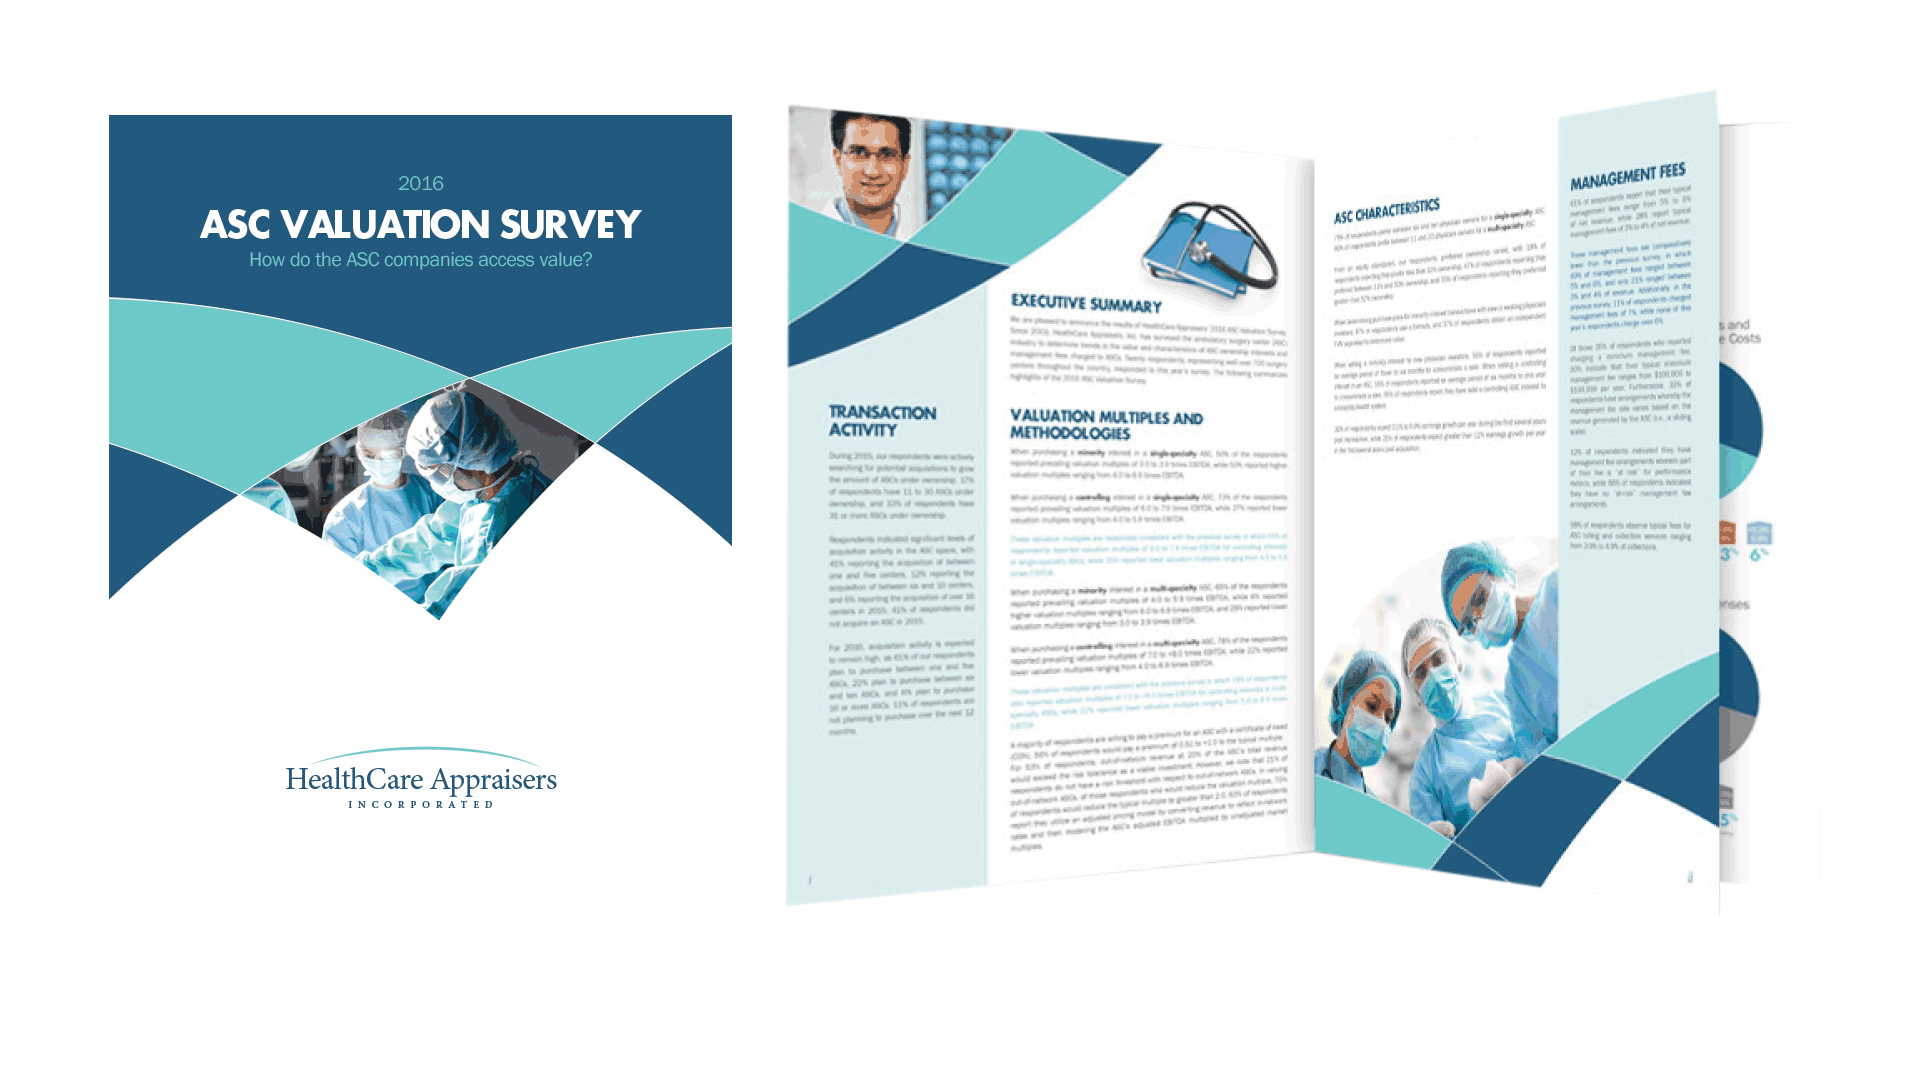 ASC Valuation Survey